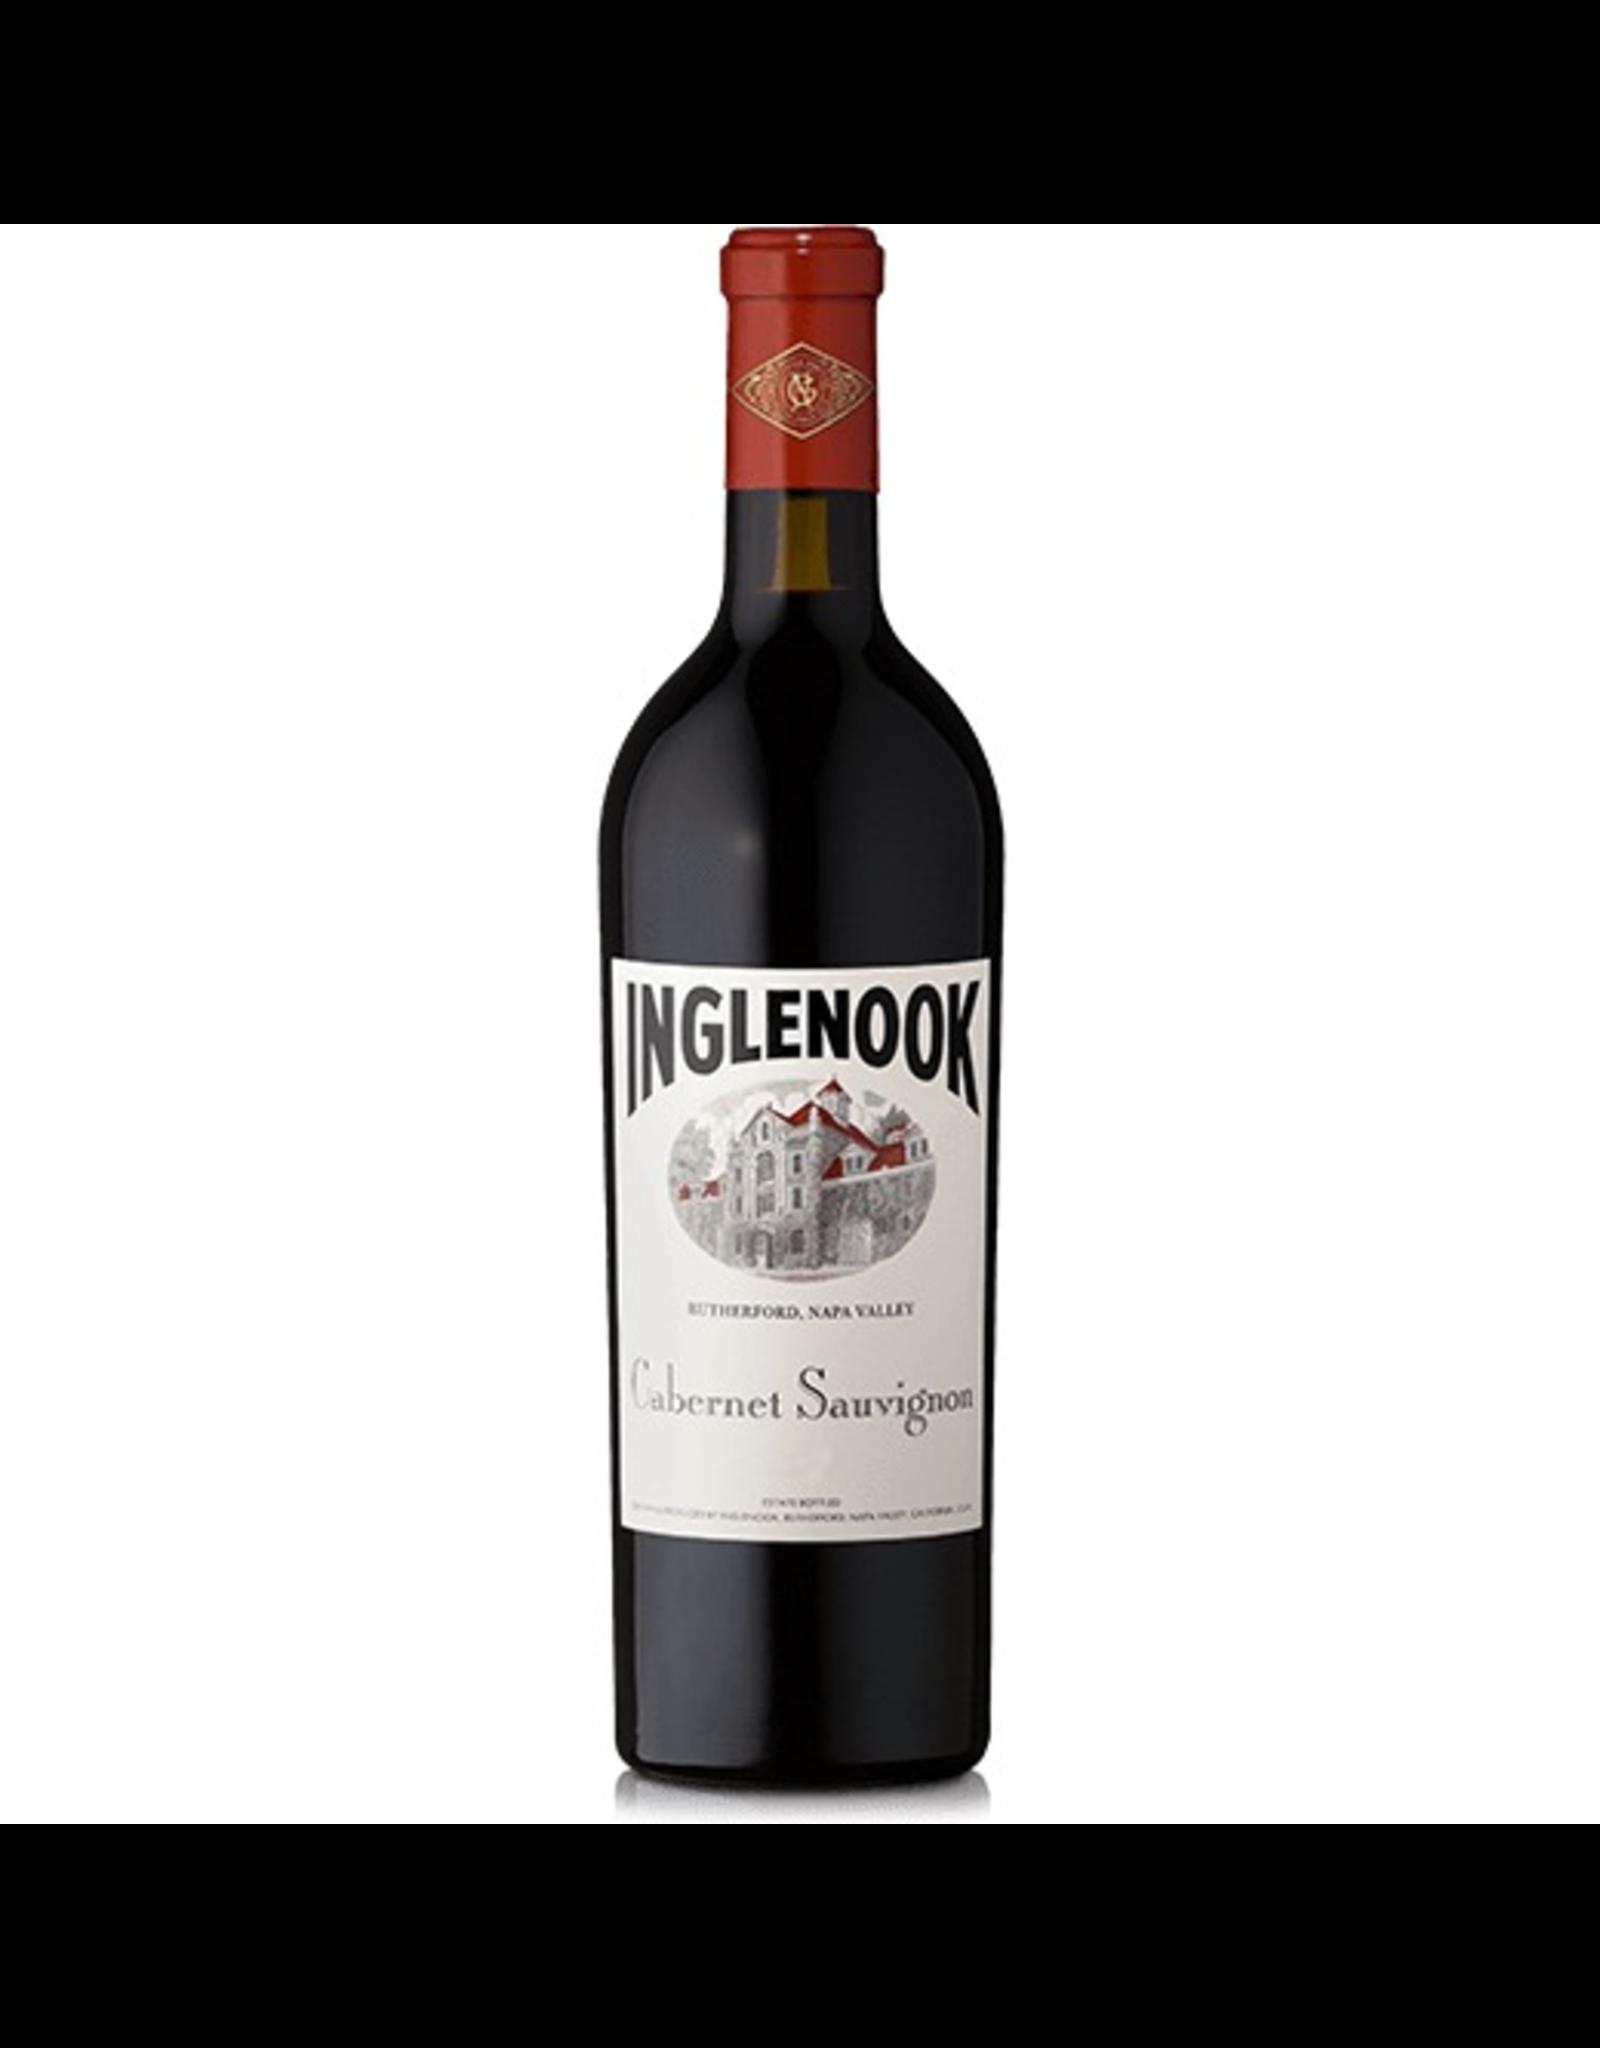 Red Wine 2015, Inglenook, Cabernet Sauvignon, Rutherford, Napa Valley, California, 14.2% Alc, JS94